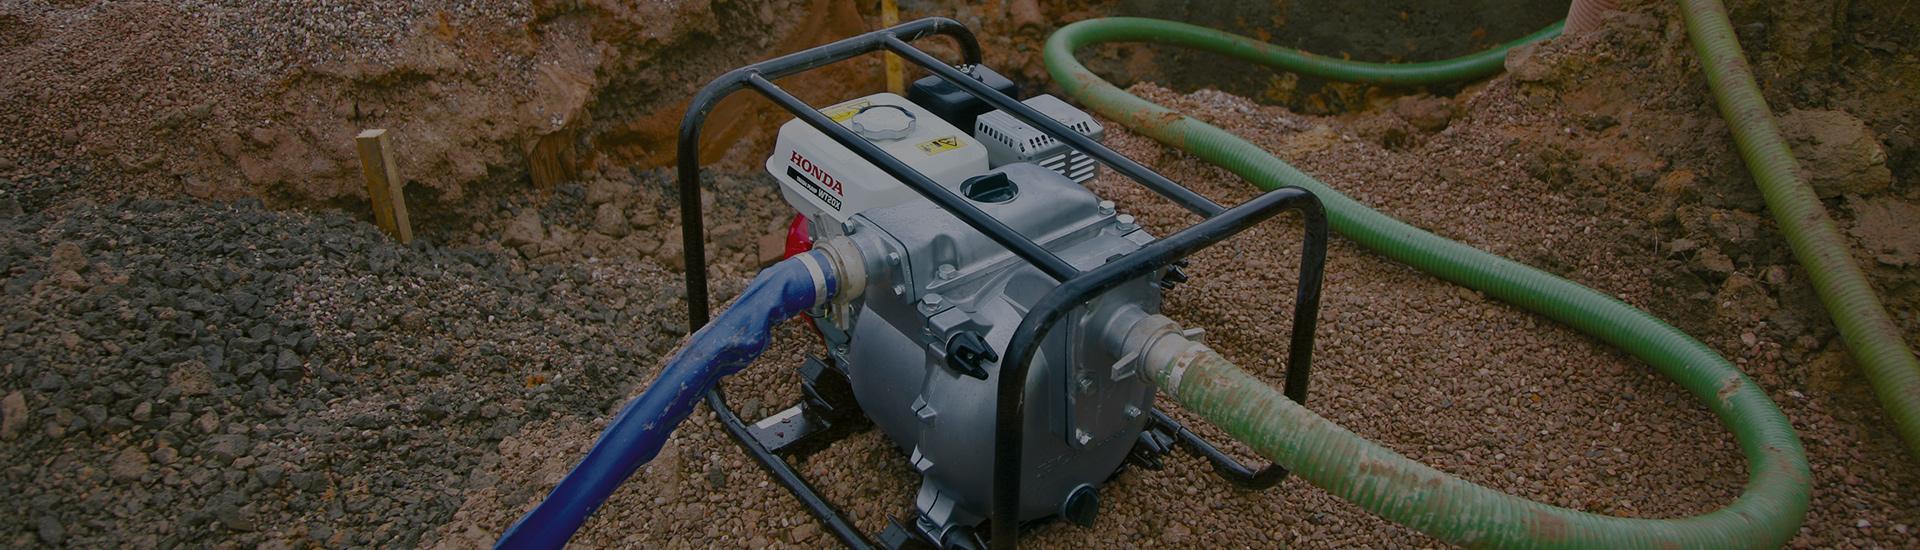 Honda generatorer og vandpumper